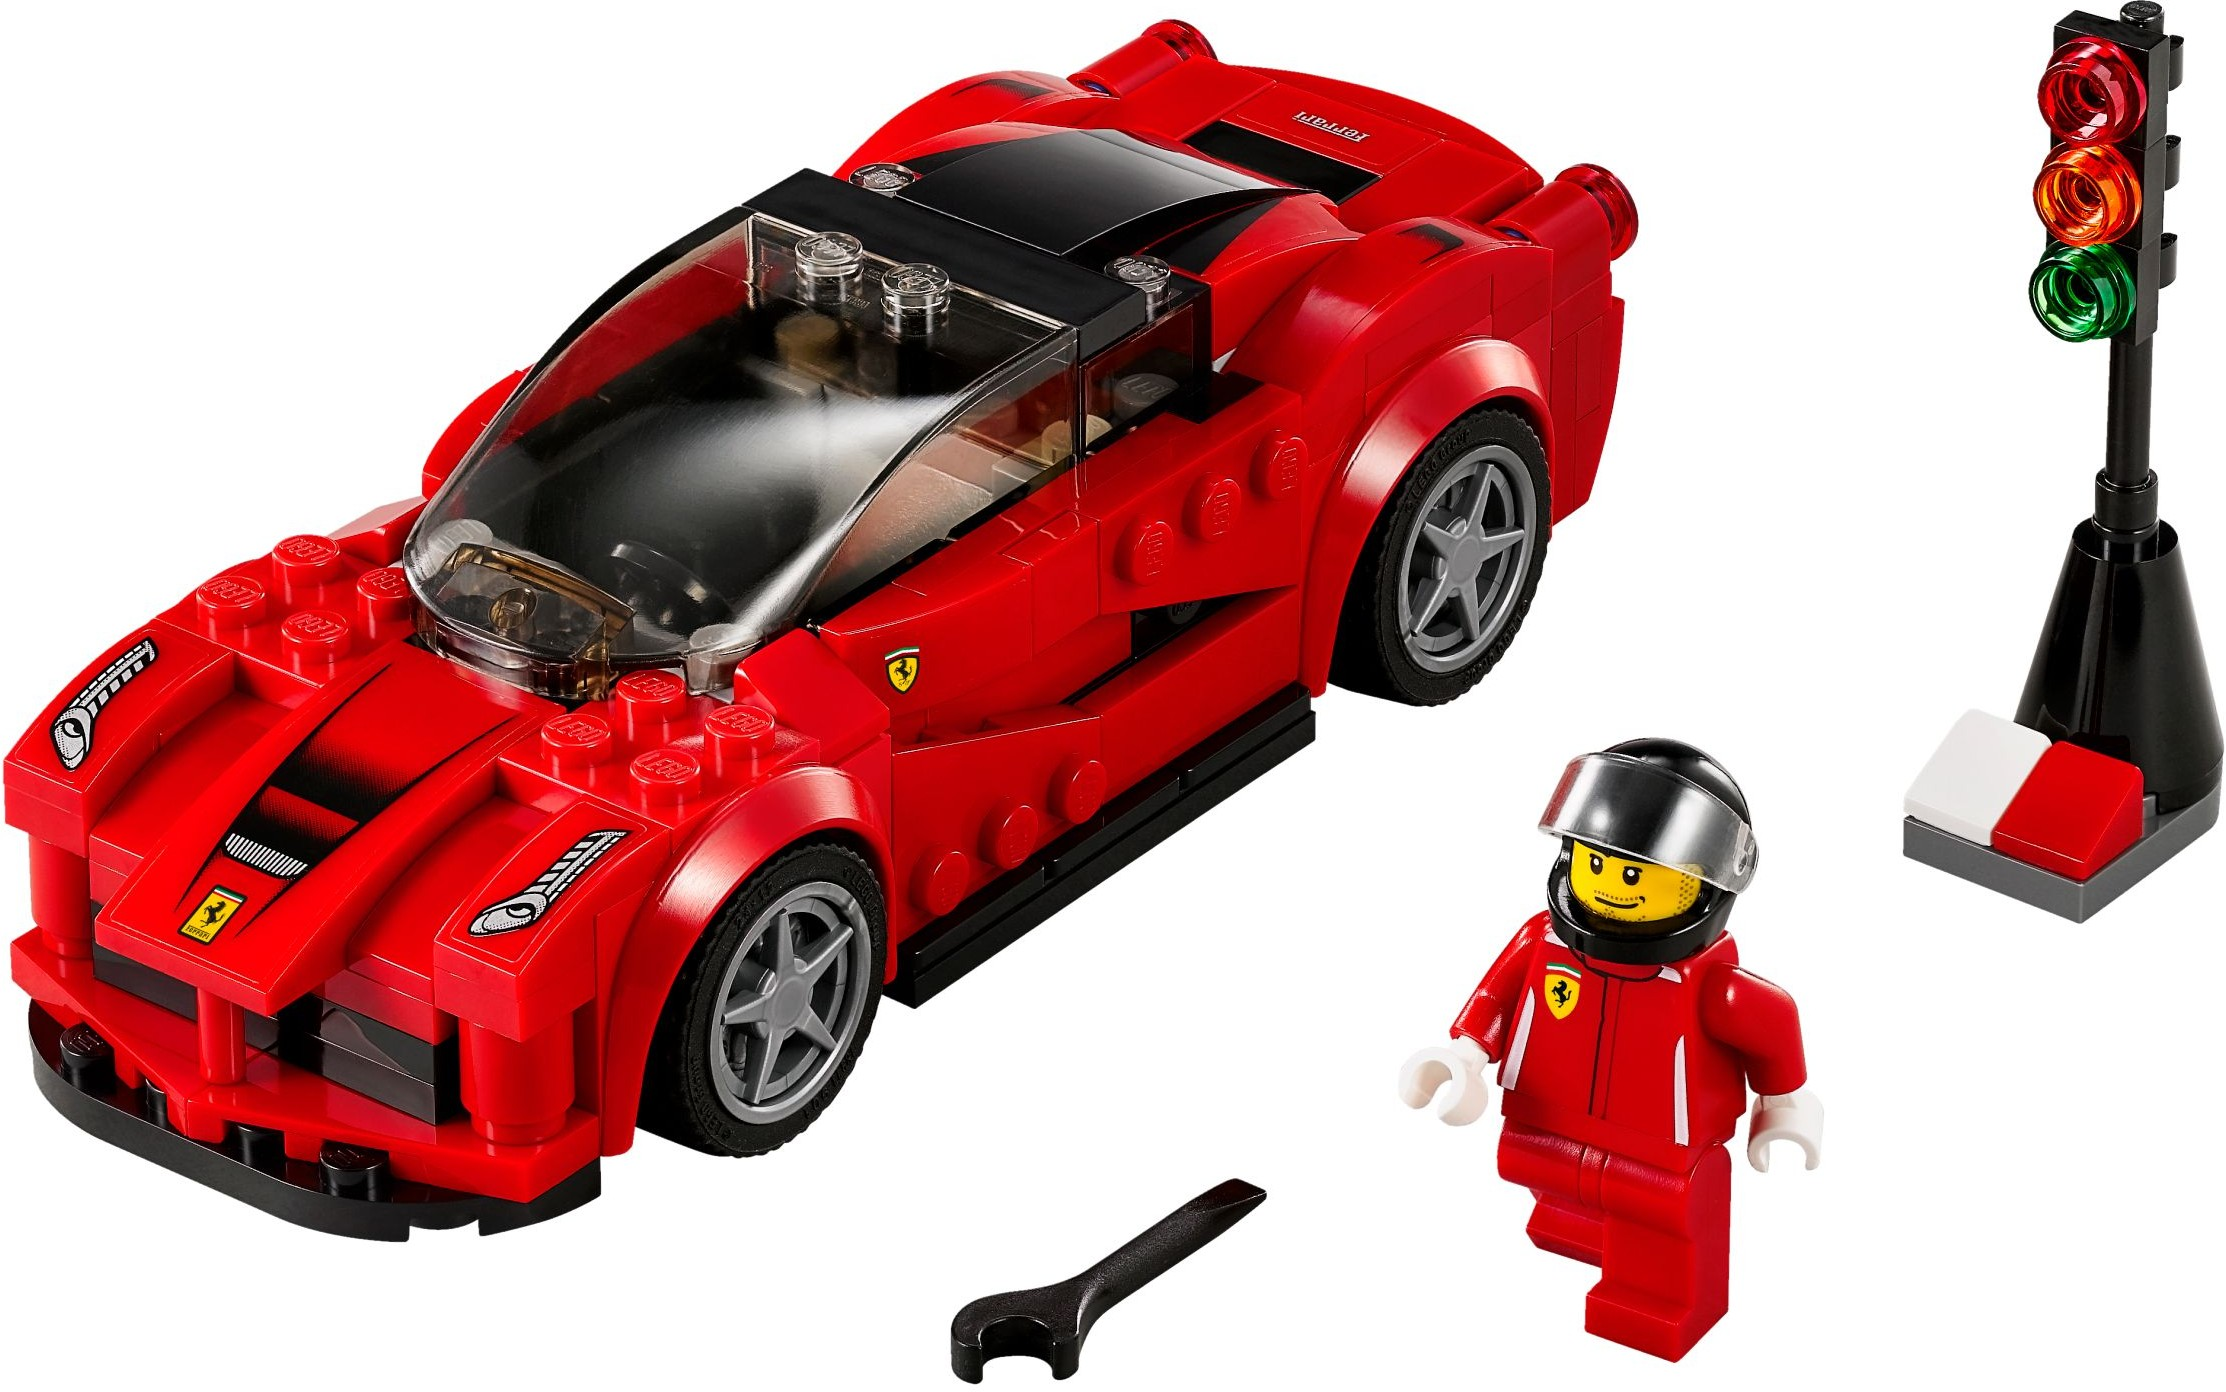 75899-1 Mesmerizing Porsche 918 Spyder Lego Review Cars Trend